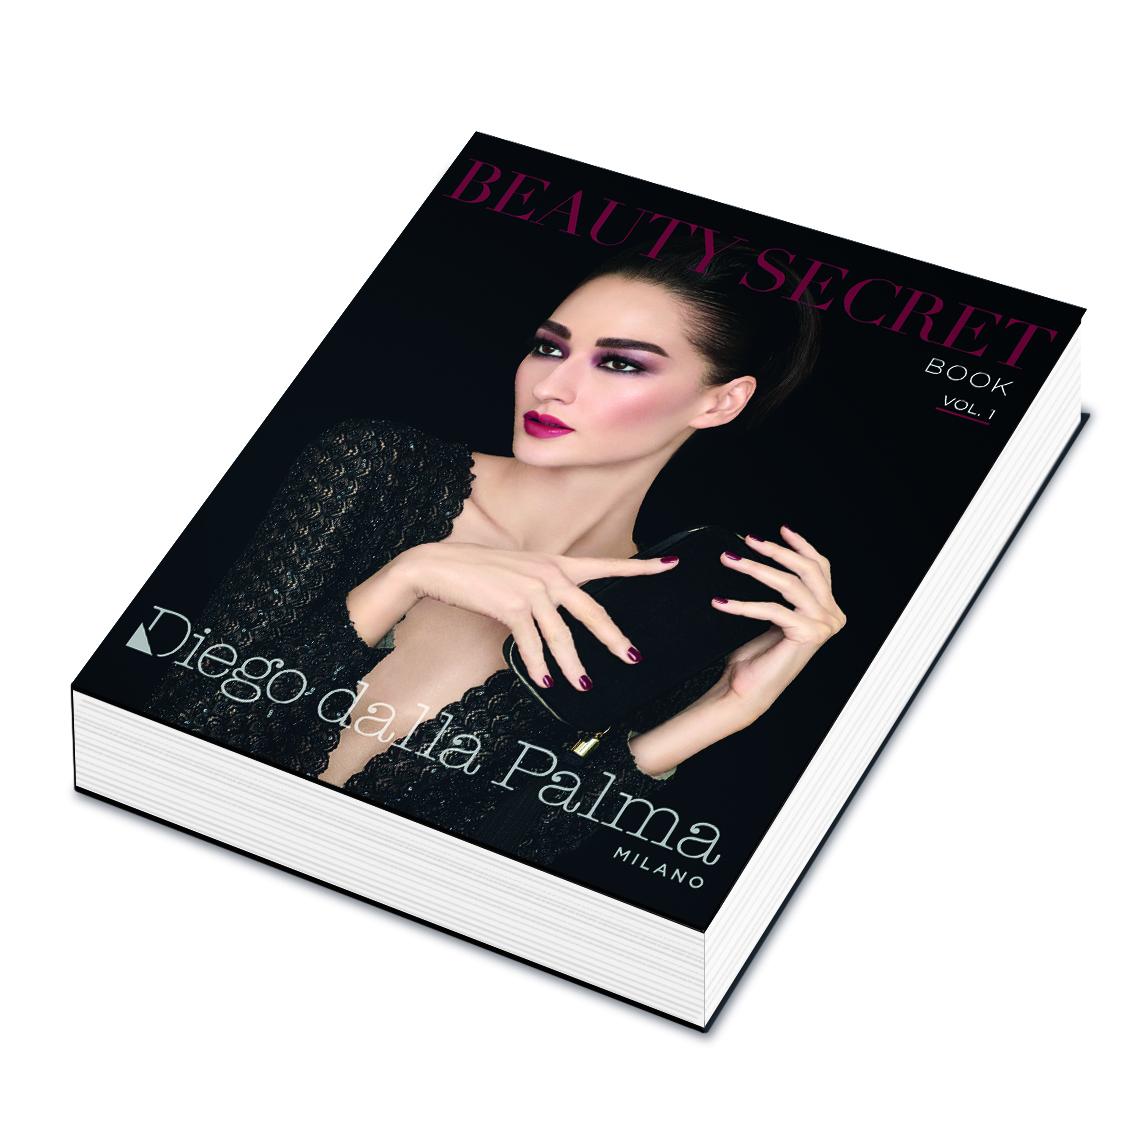 Kit Beauty Secret Book Diego della Palma